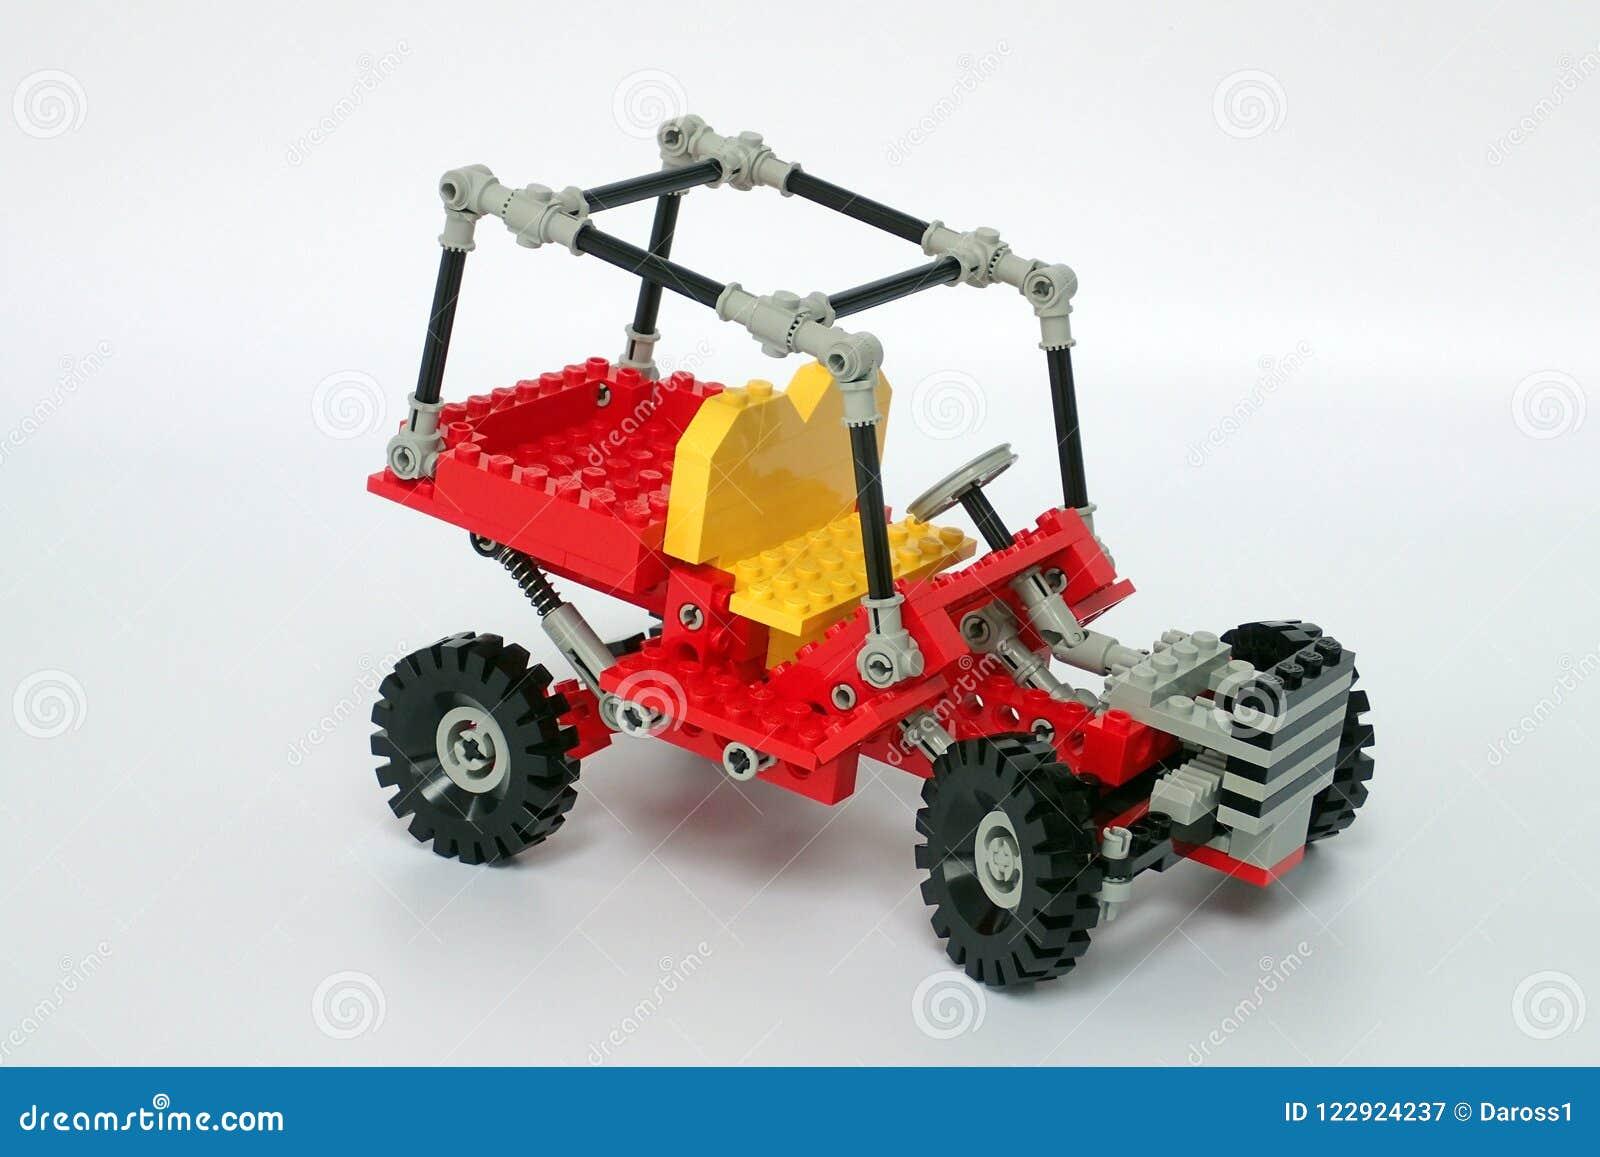 Lego Technic Set No 8845, Dune Buggy Editorial Photography